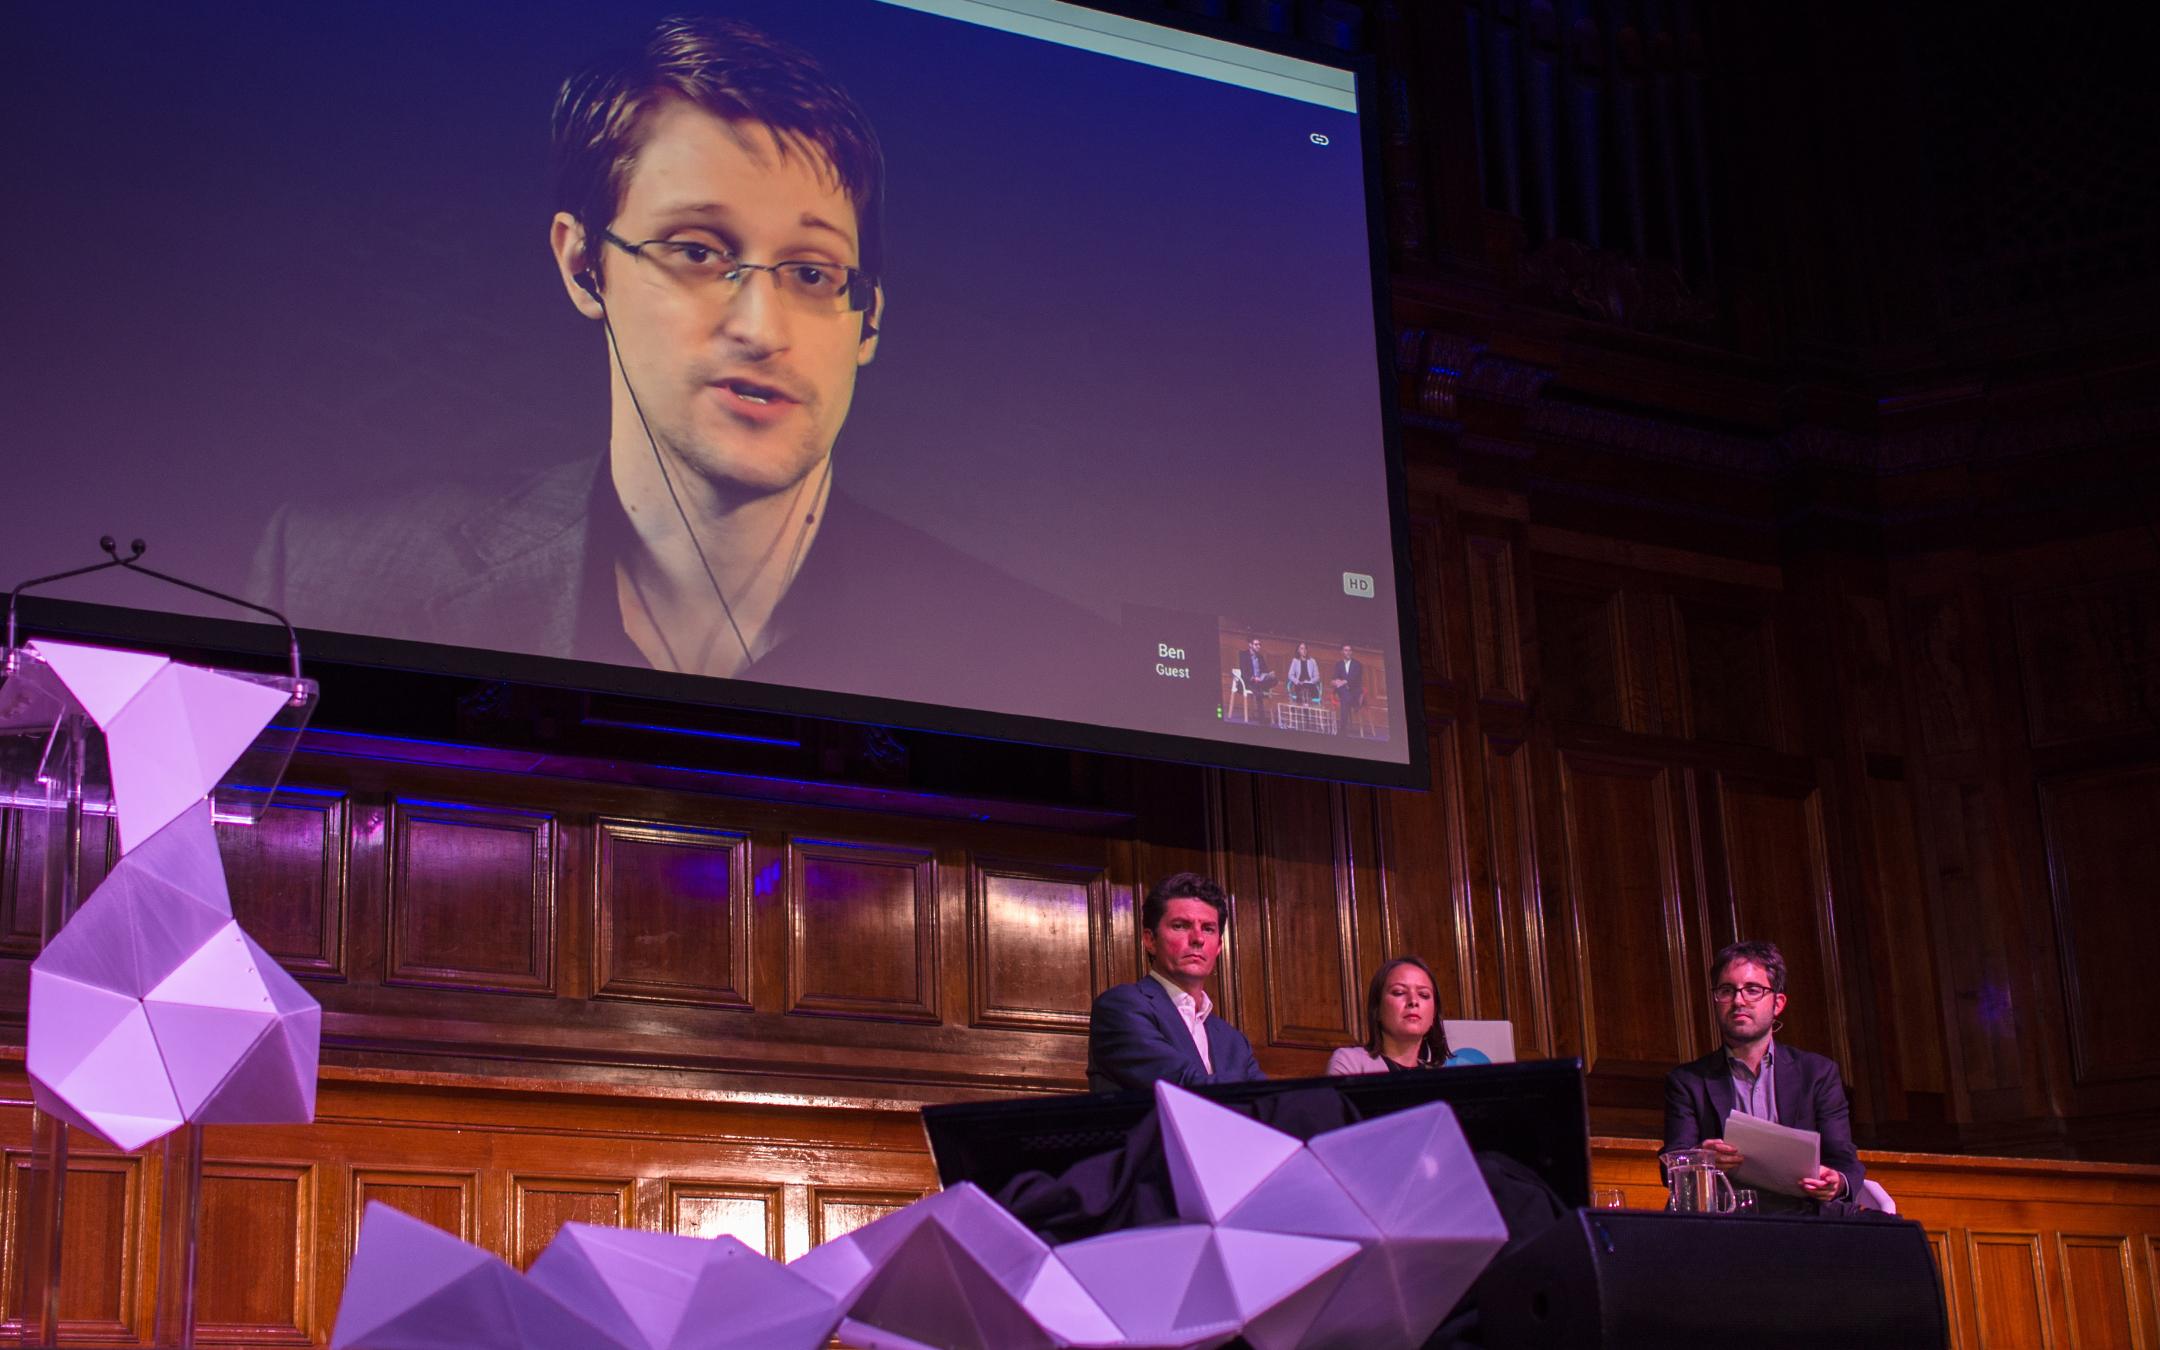 Edward Snowden Progress 2015